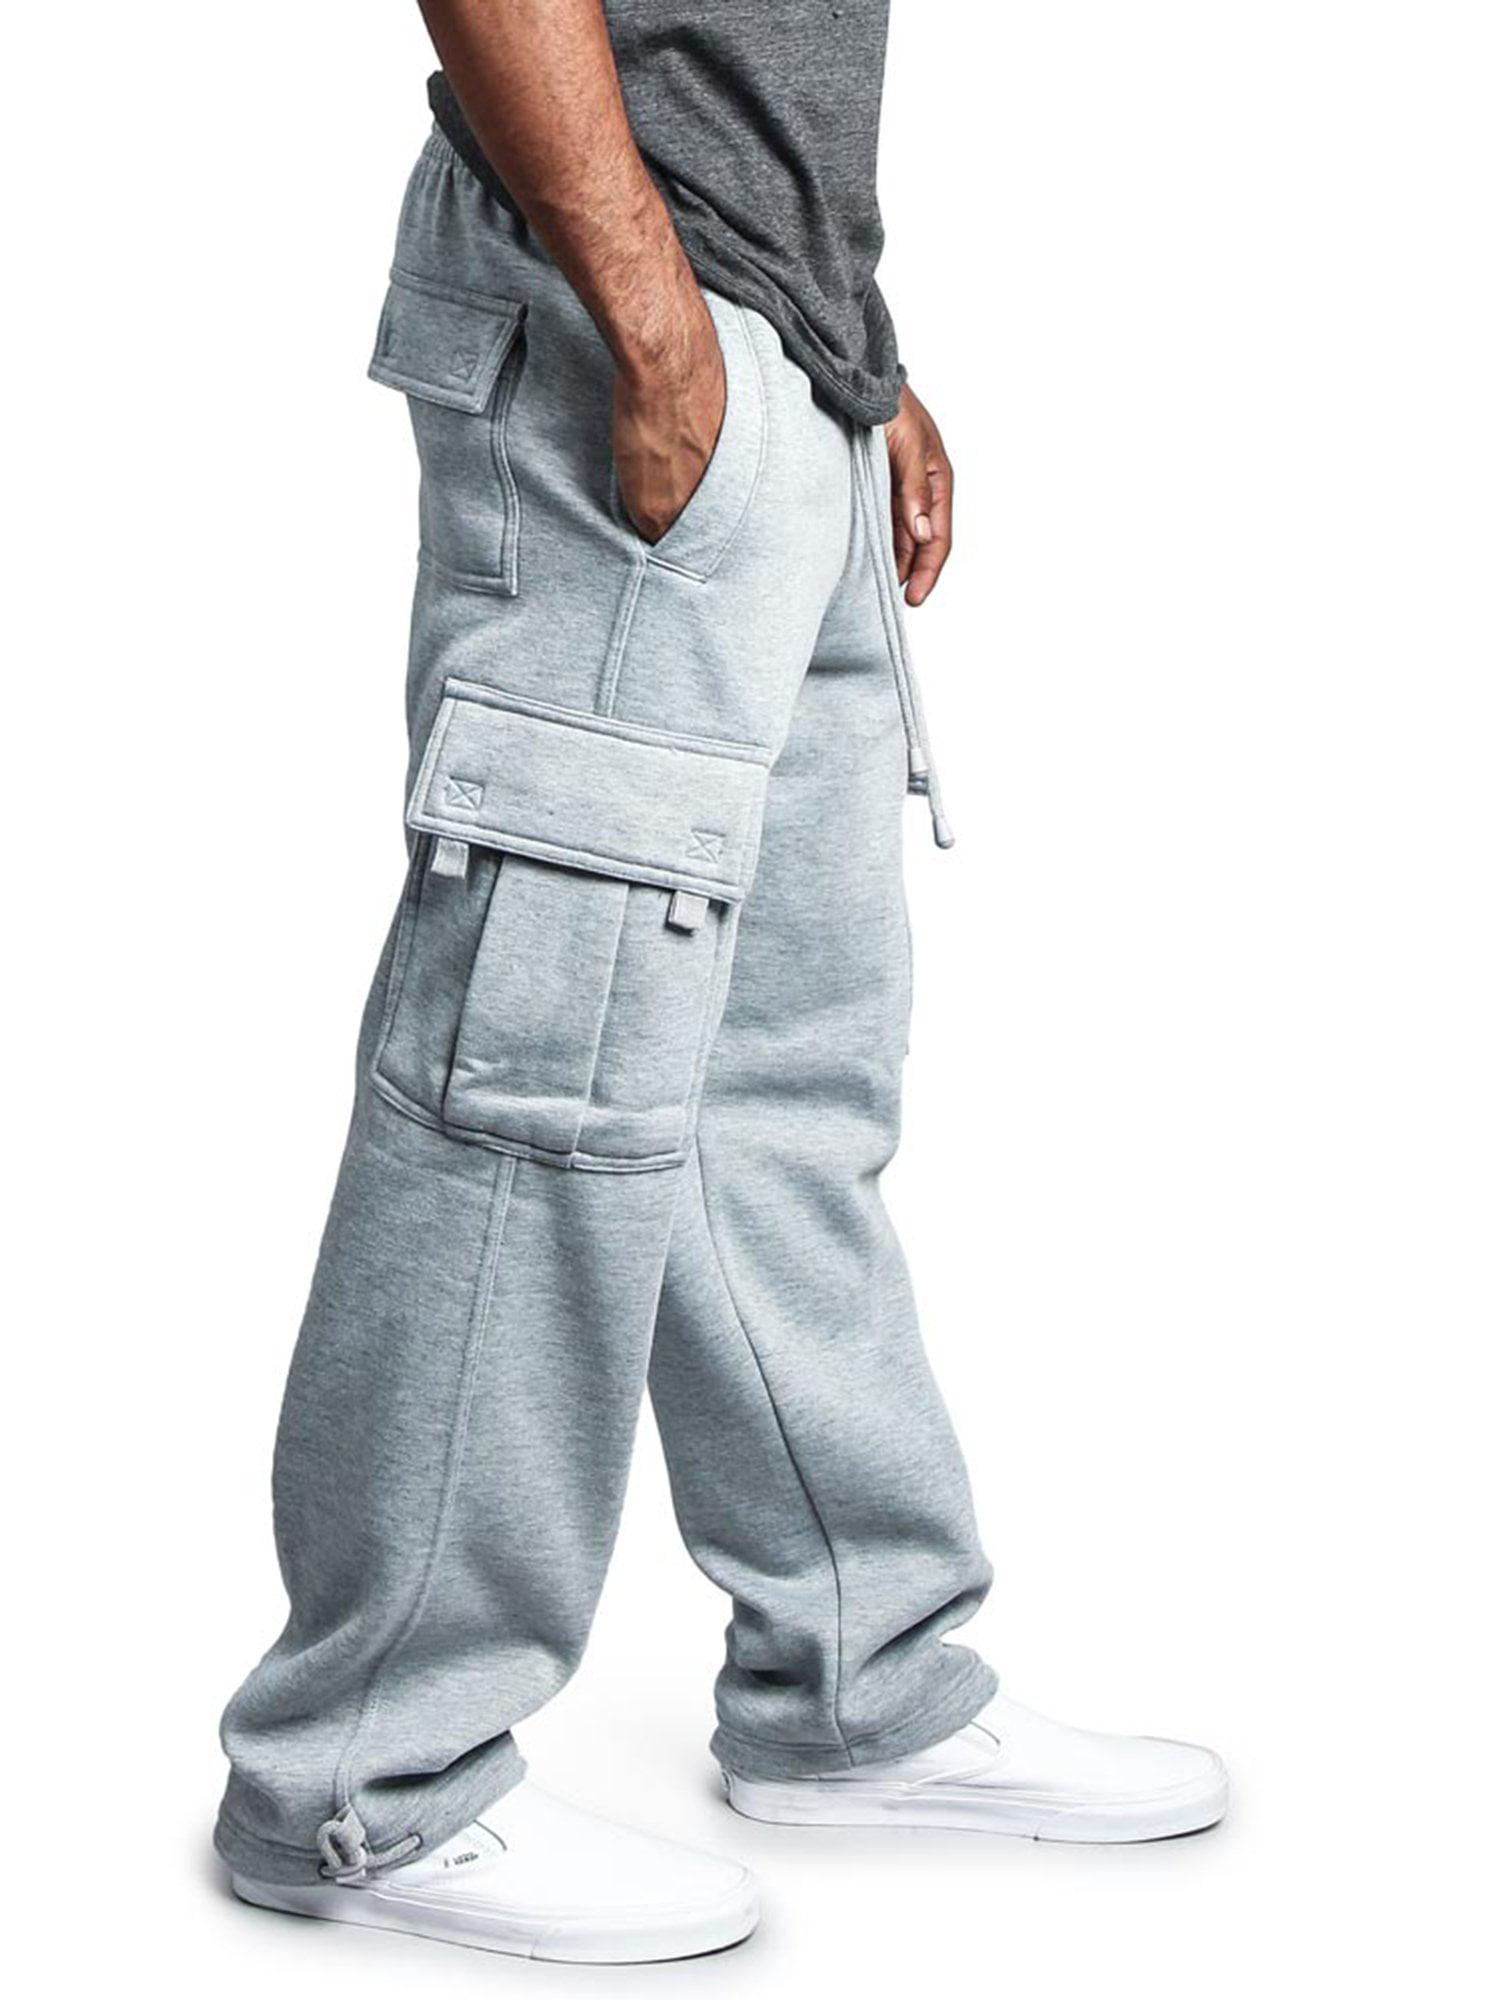 FS76 G-Style USA Men/'s Heavy Weight Fleece Cargo Pocket Sweat Short Pants S~6XL